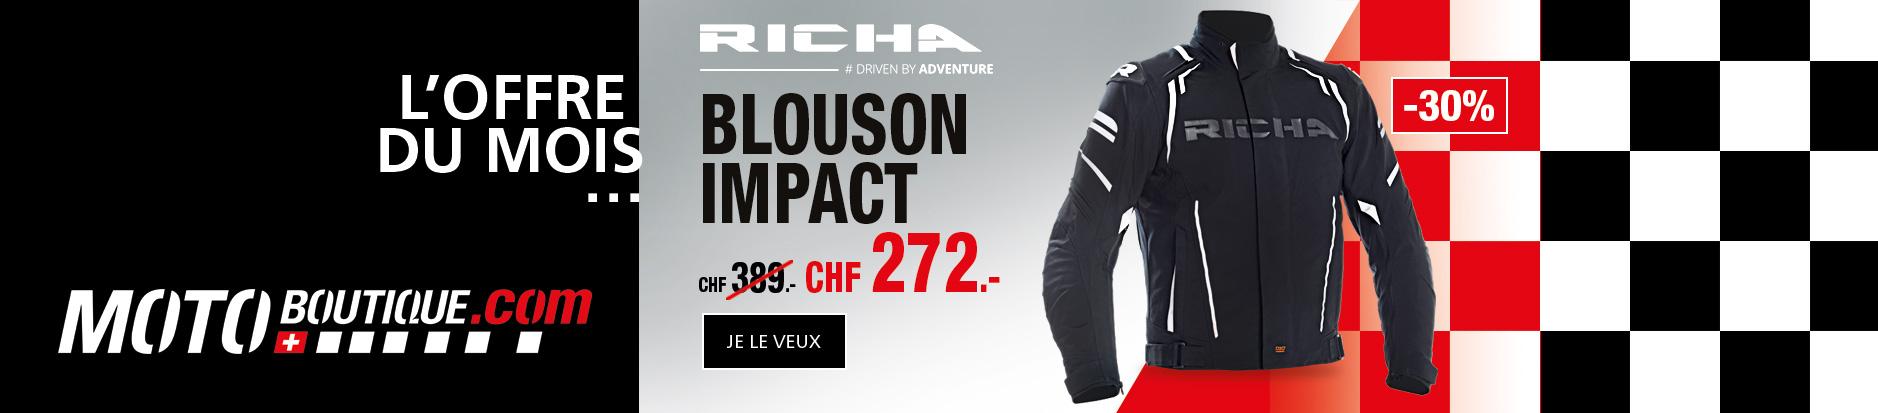 Richa Blouson Impact